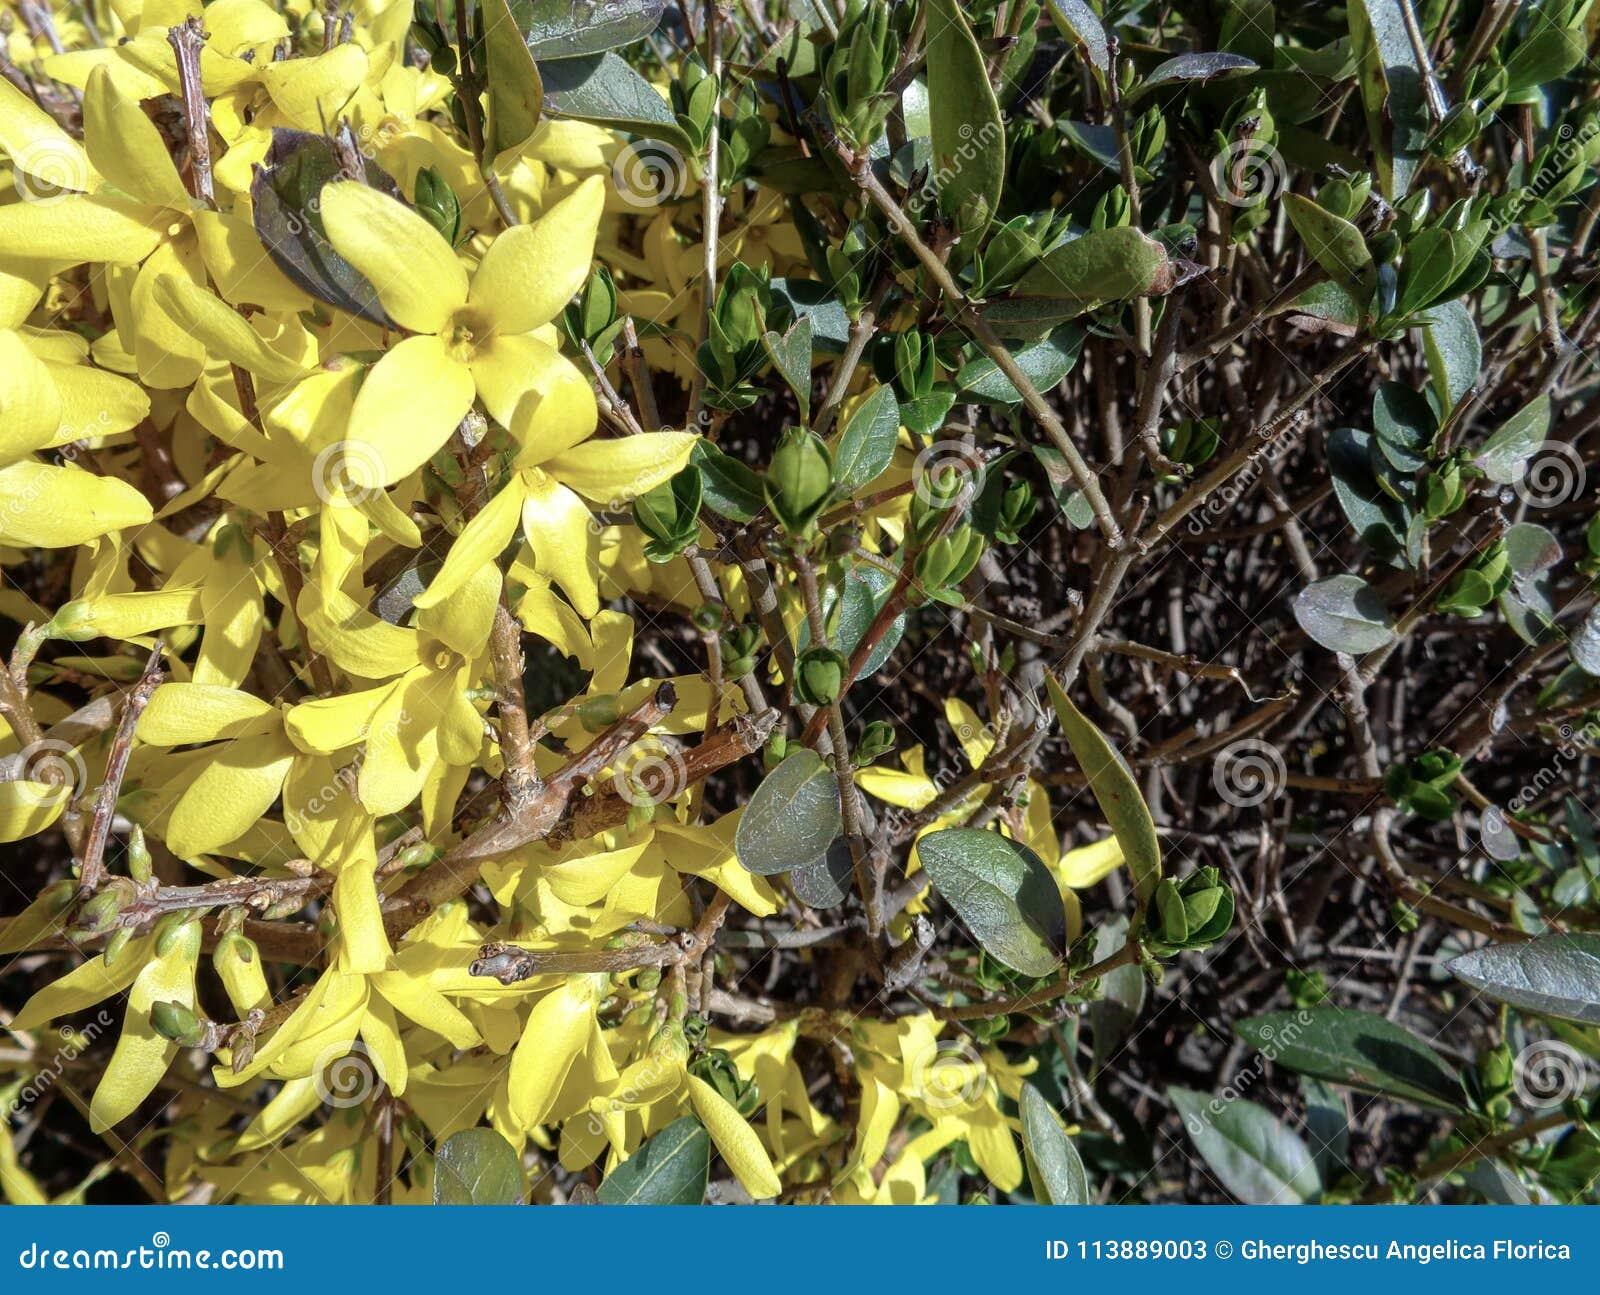 Bright forsythia flowers in spring bushes stock image image of bright forsythia flowers in spring bushes mightylinksfo